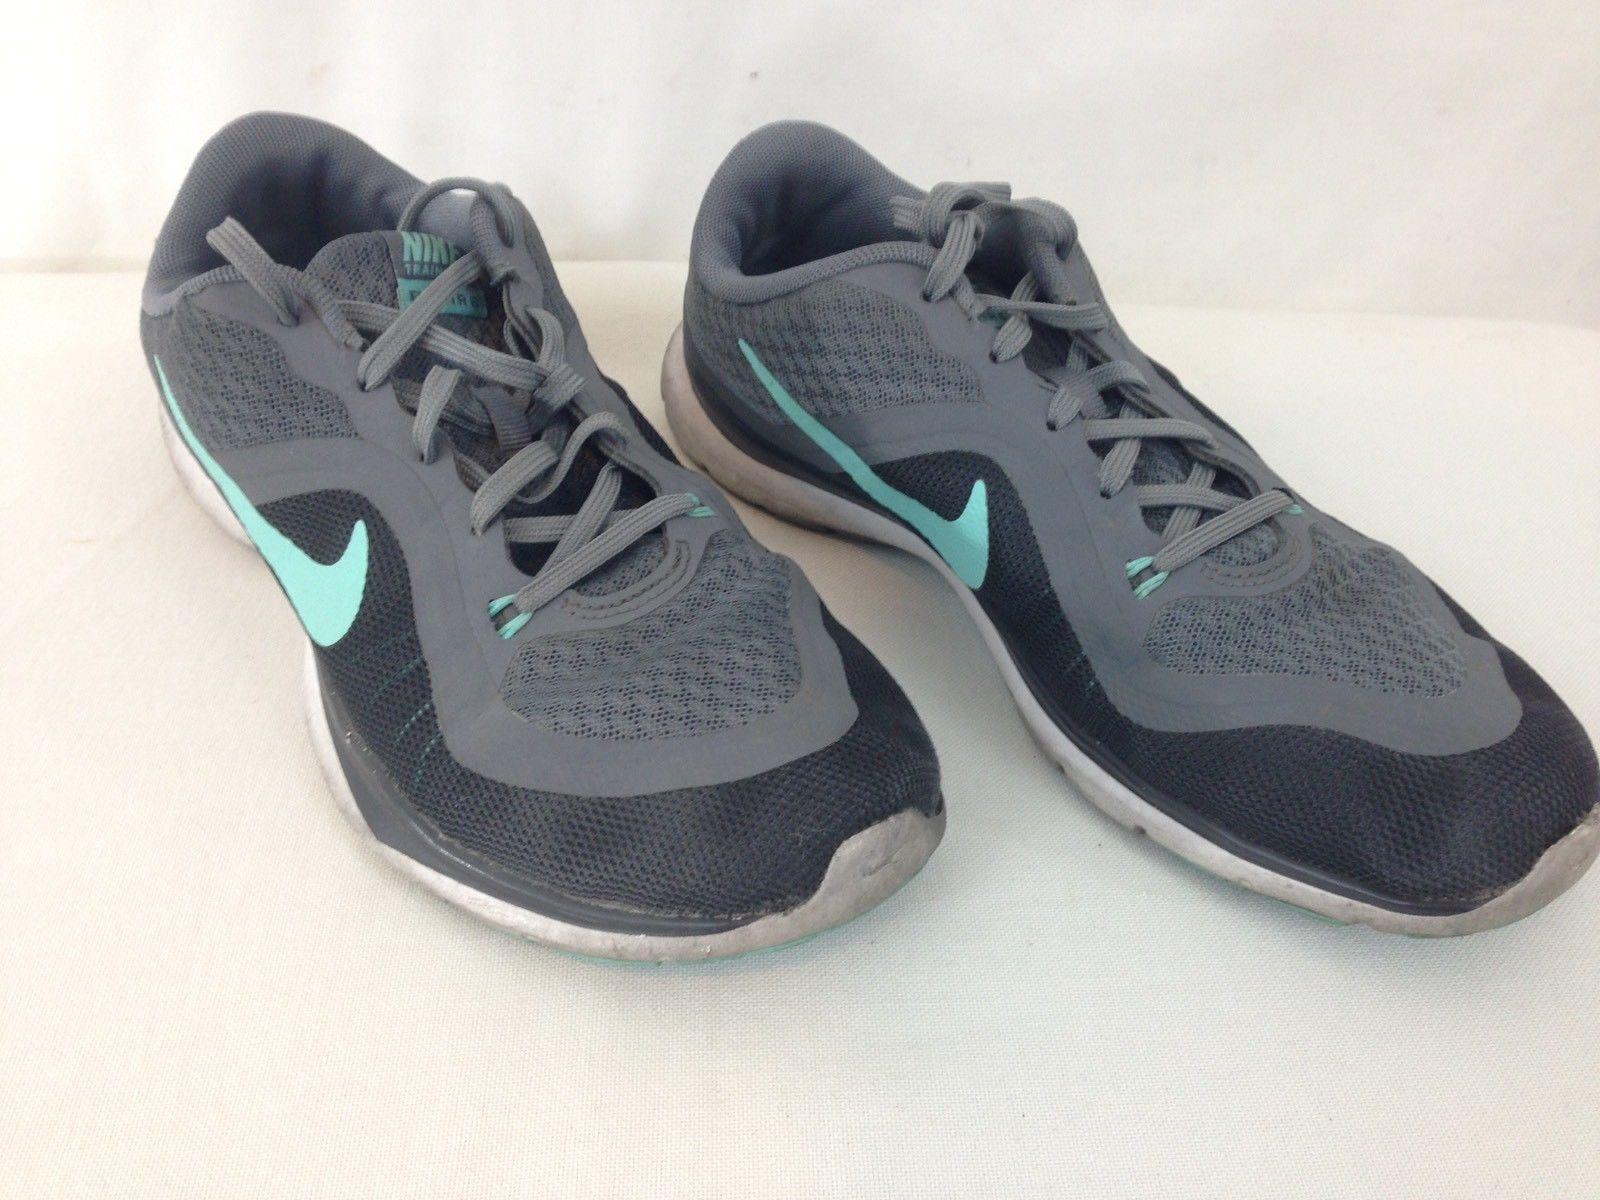 09a566ac429bf Nike 831217-004 Training Flex Tr 6 Womens size 8 Gray Teal Walking Running  Shoes